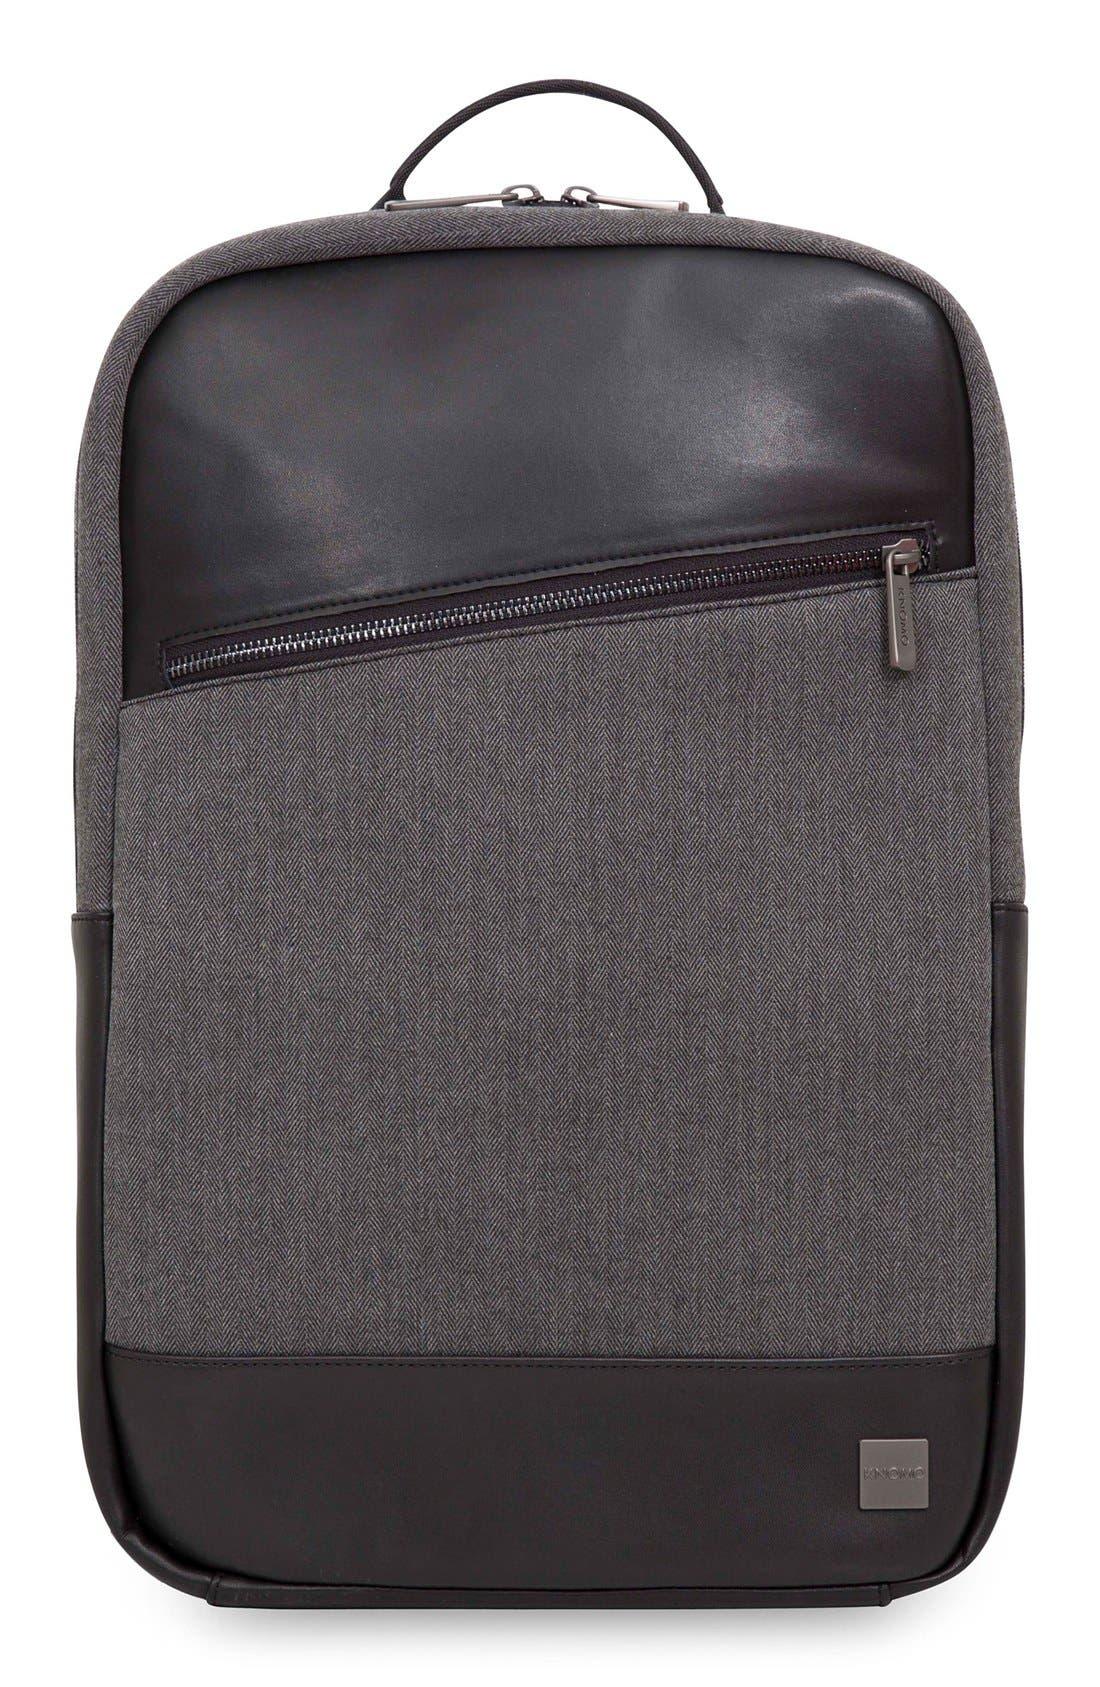 KNOMO London Holborn Southampton Backpack